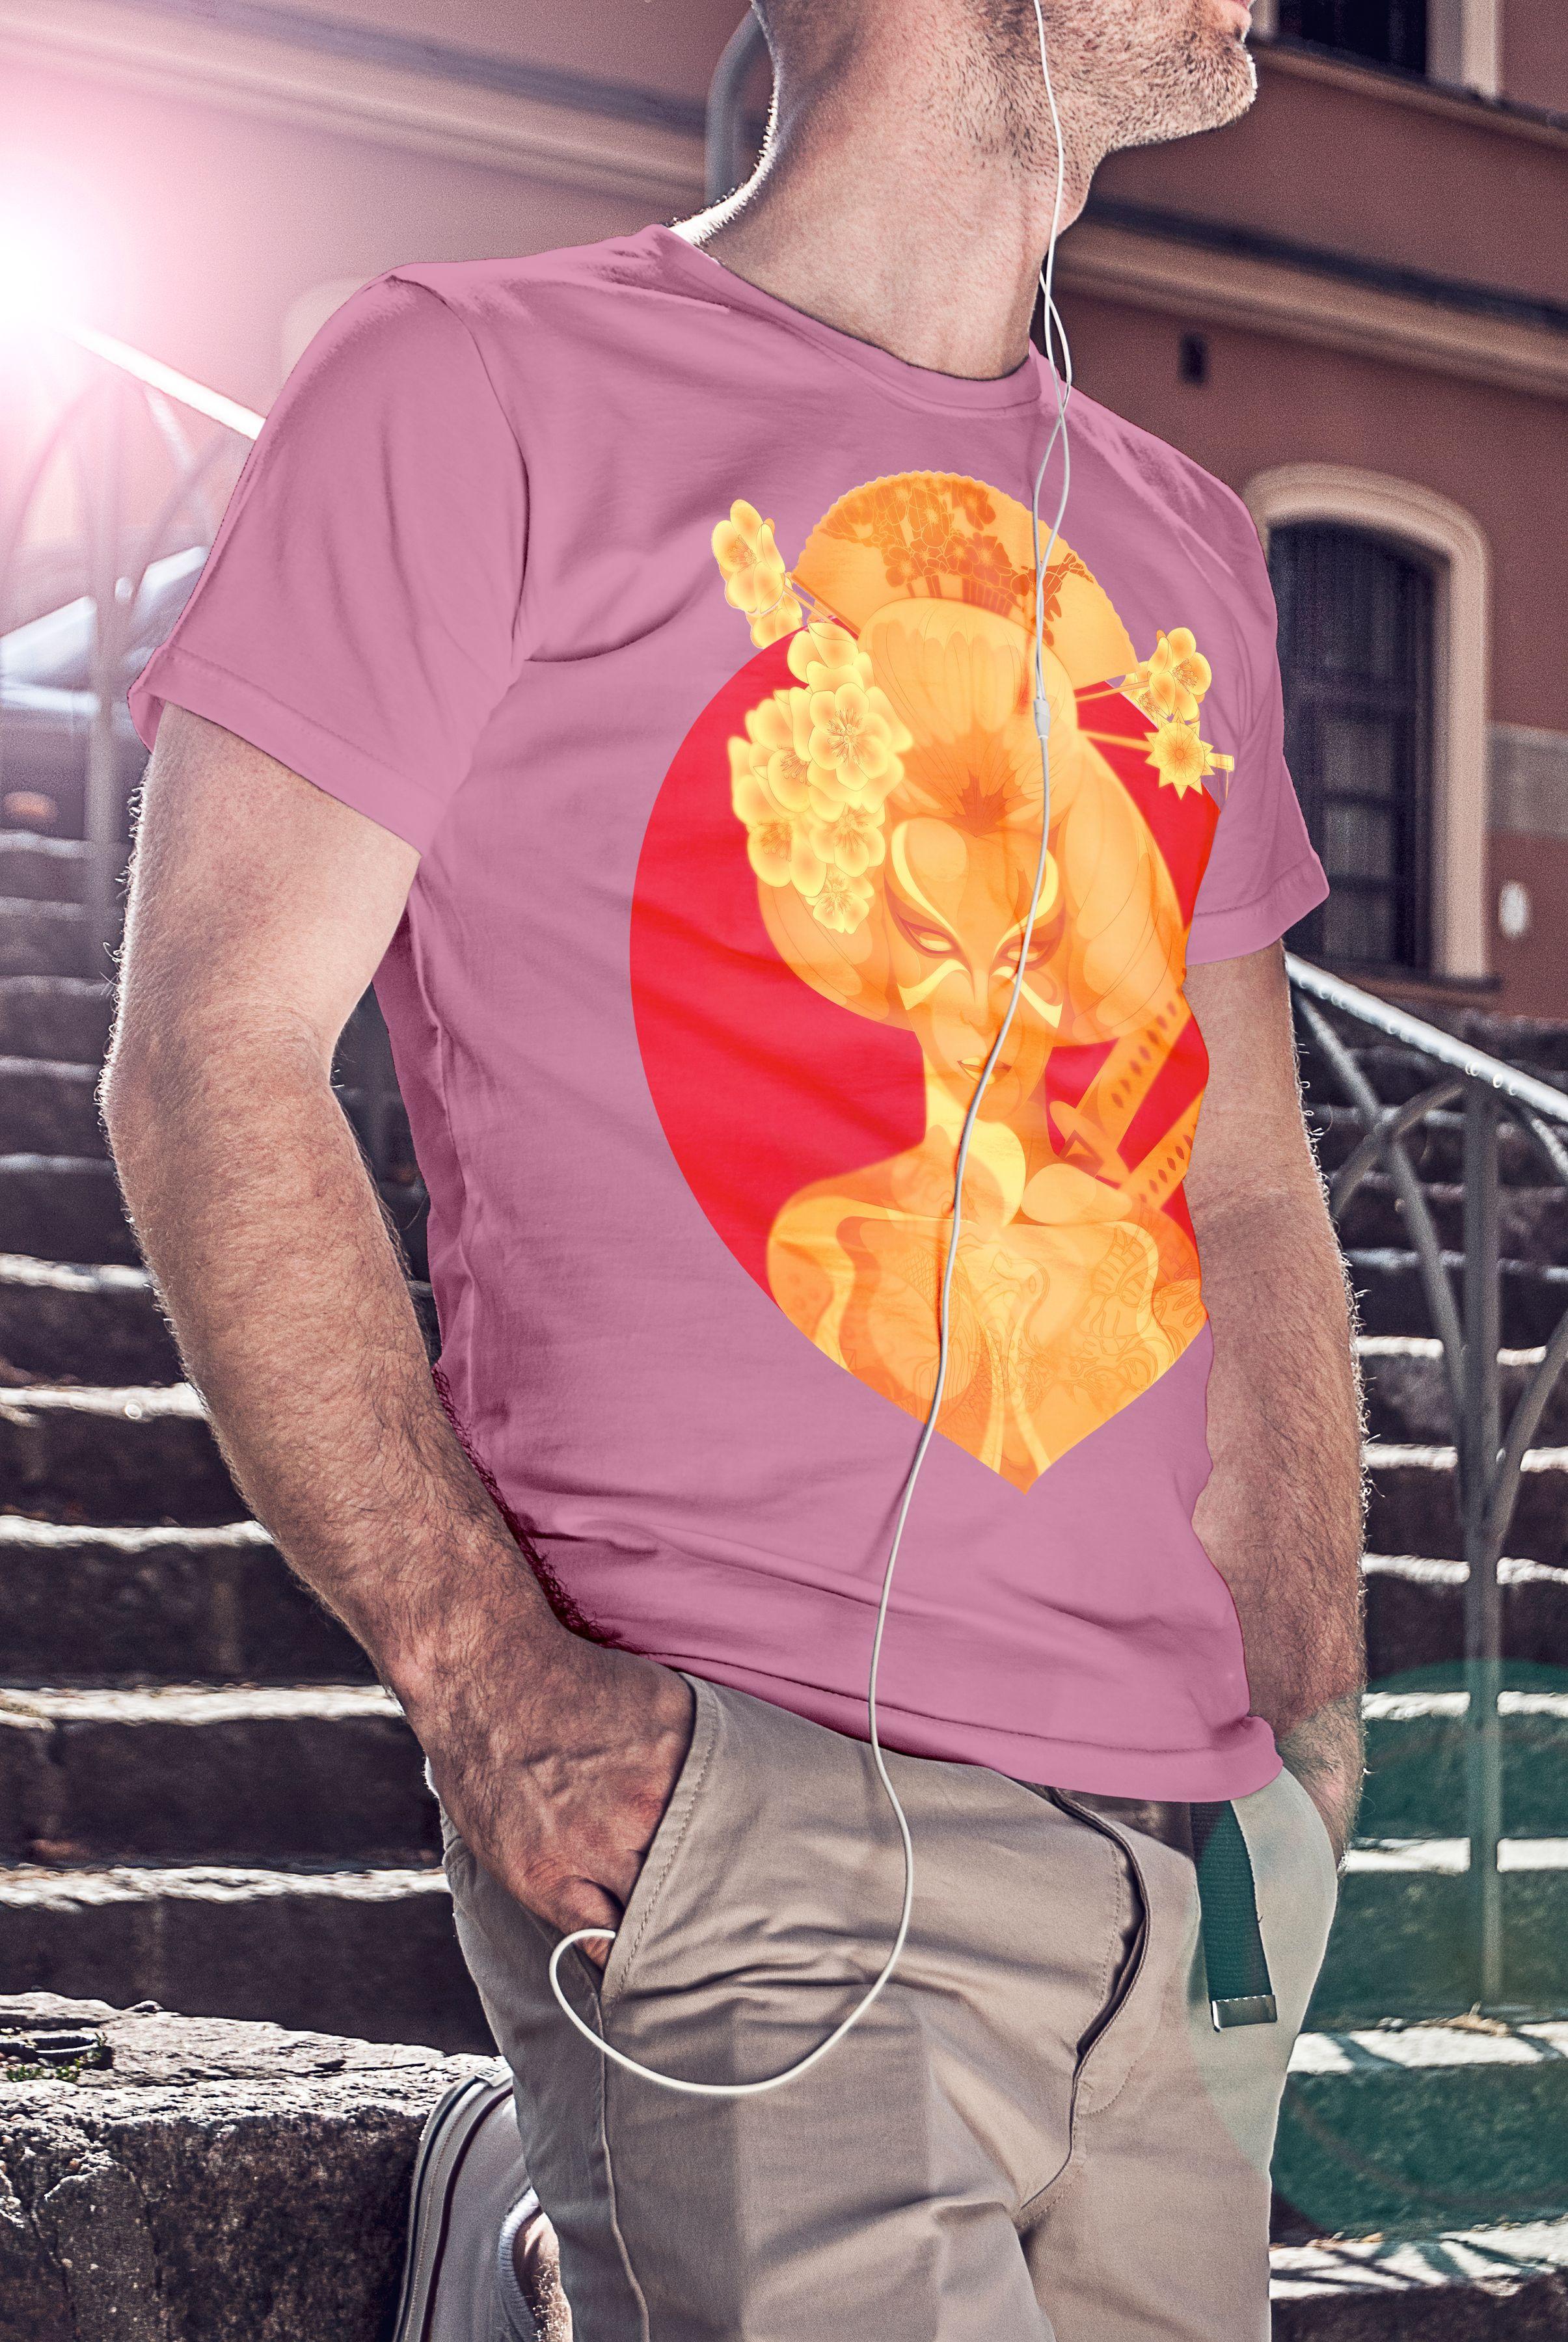 2e91e3d8 Anvil 980 Lightweight Fashion Short Sleeve T-Shirt with TearAway Label.  Geisha - Design. Charity pink